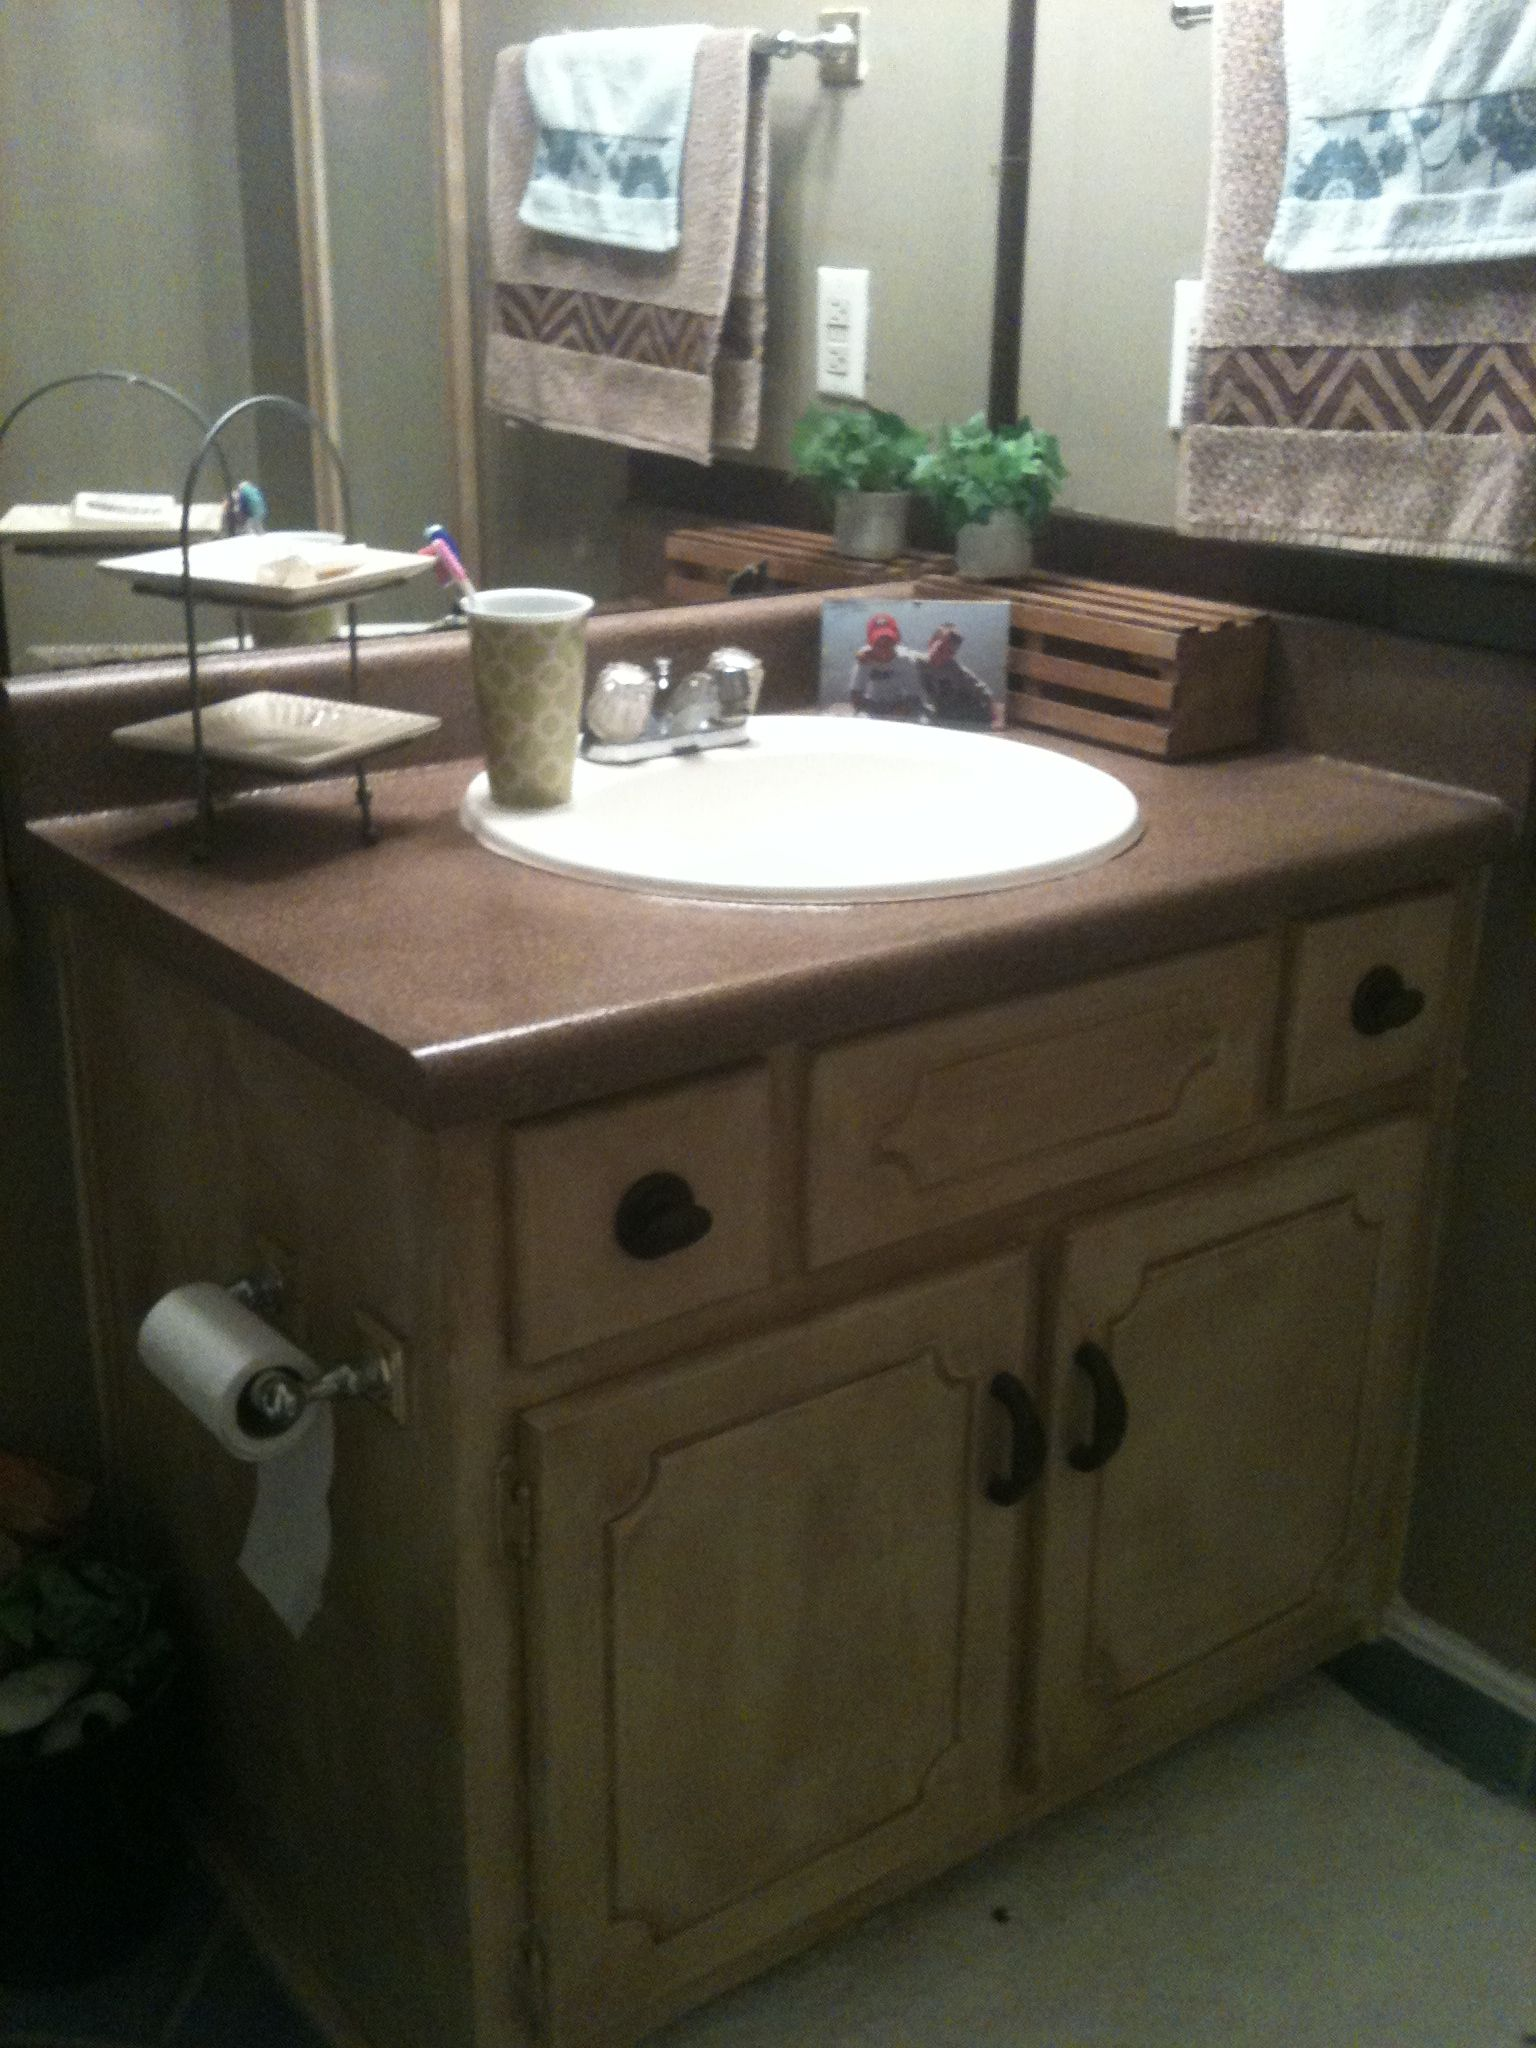 Bathroom Vanity Redone It Was All White Countertop Spray Painted